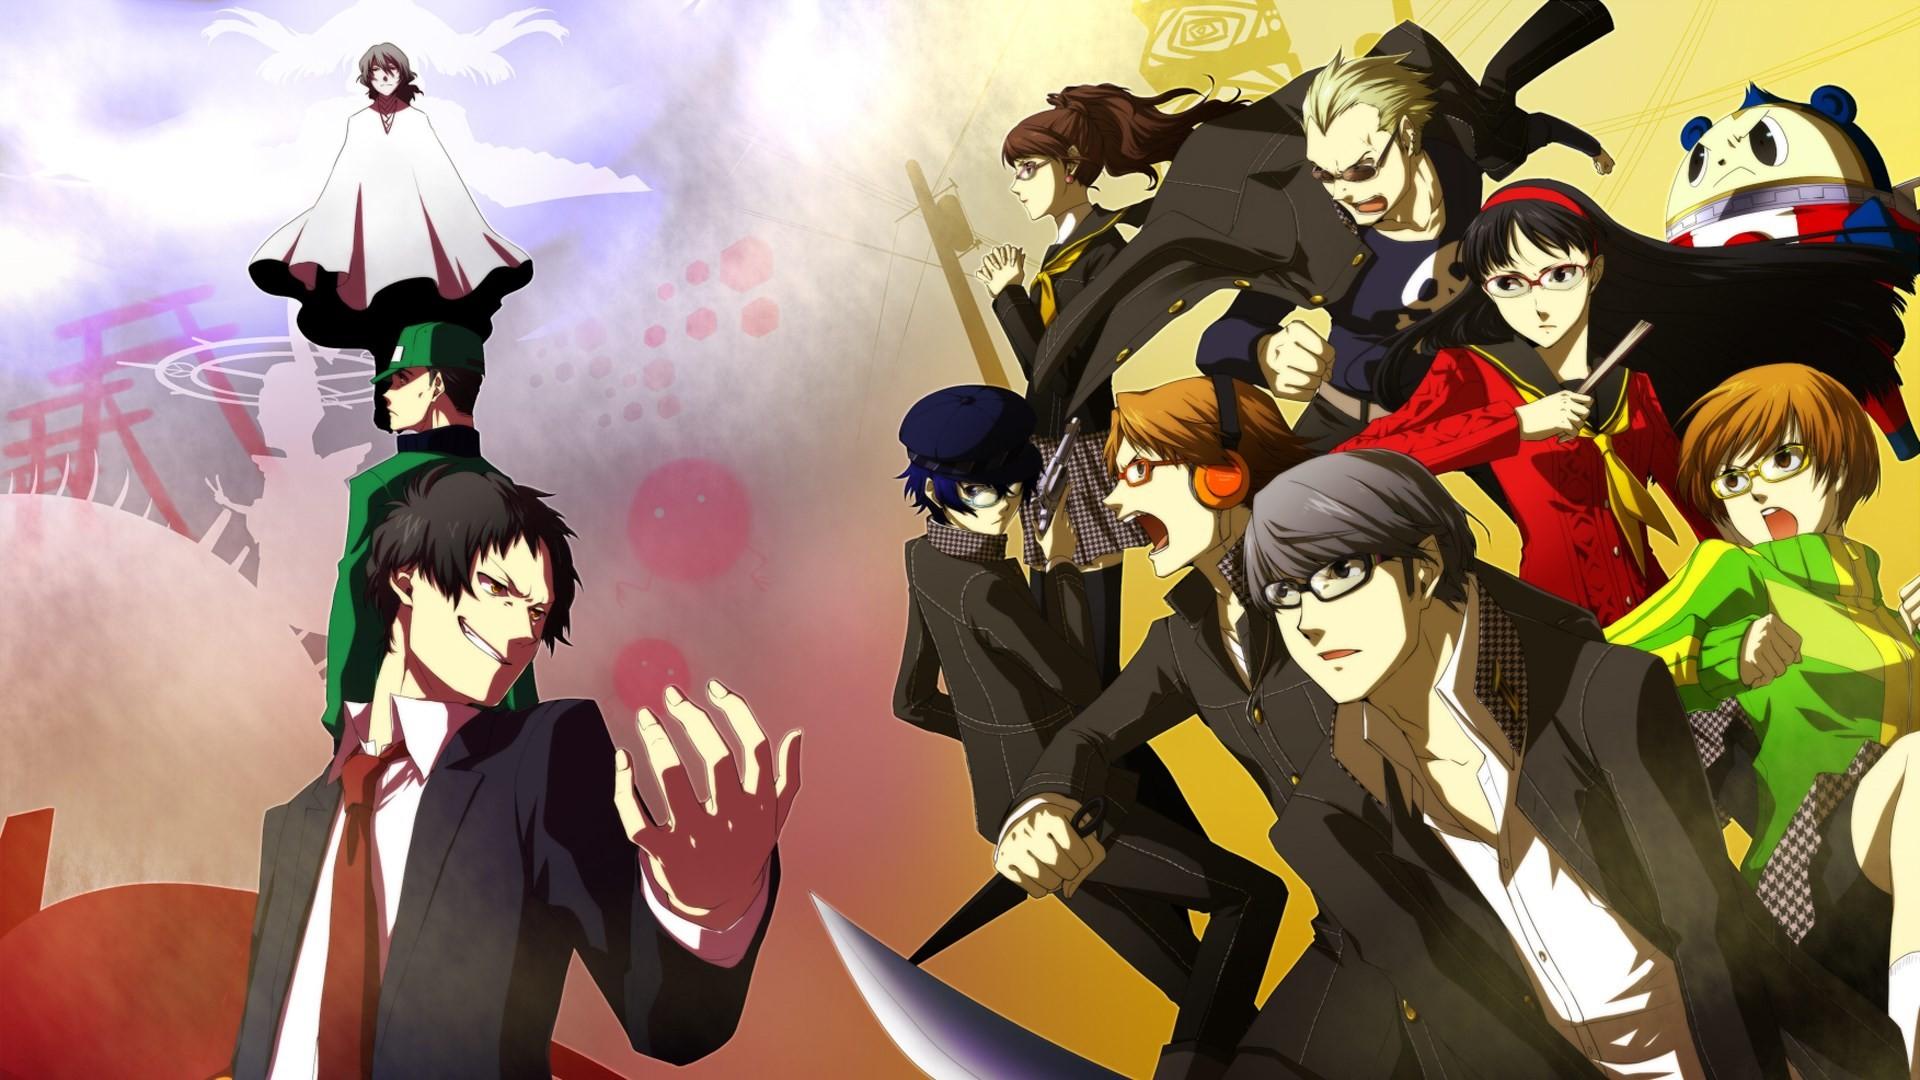 The 25+ best Persona 4 wallpaper ideas on Pinterest | Persona 3 anime, Shin  megami tensei 3 and Persona 4